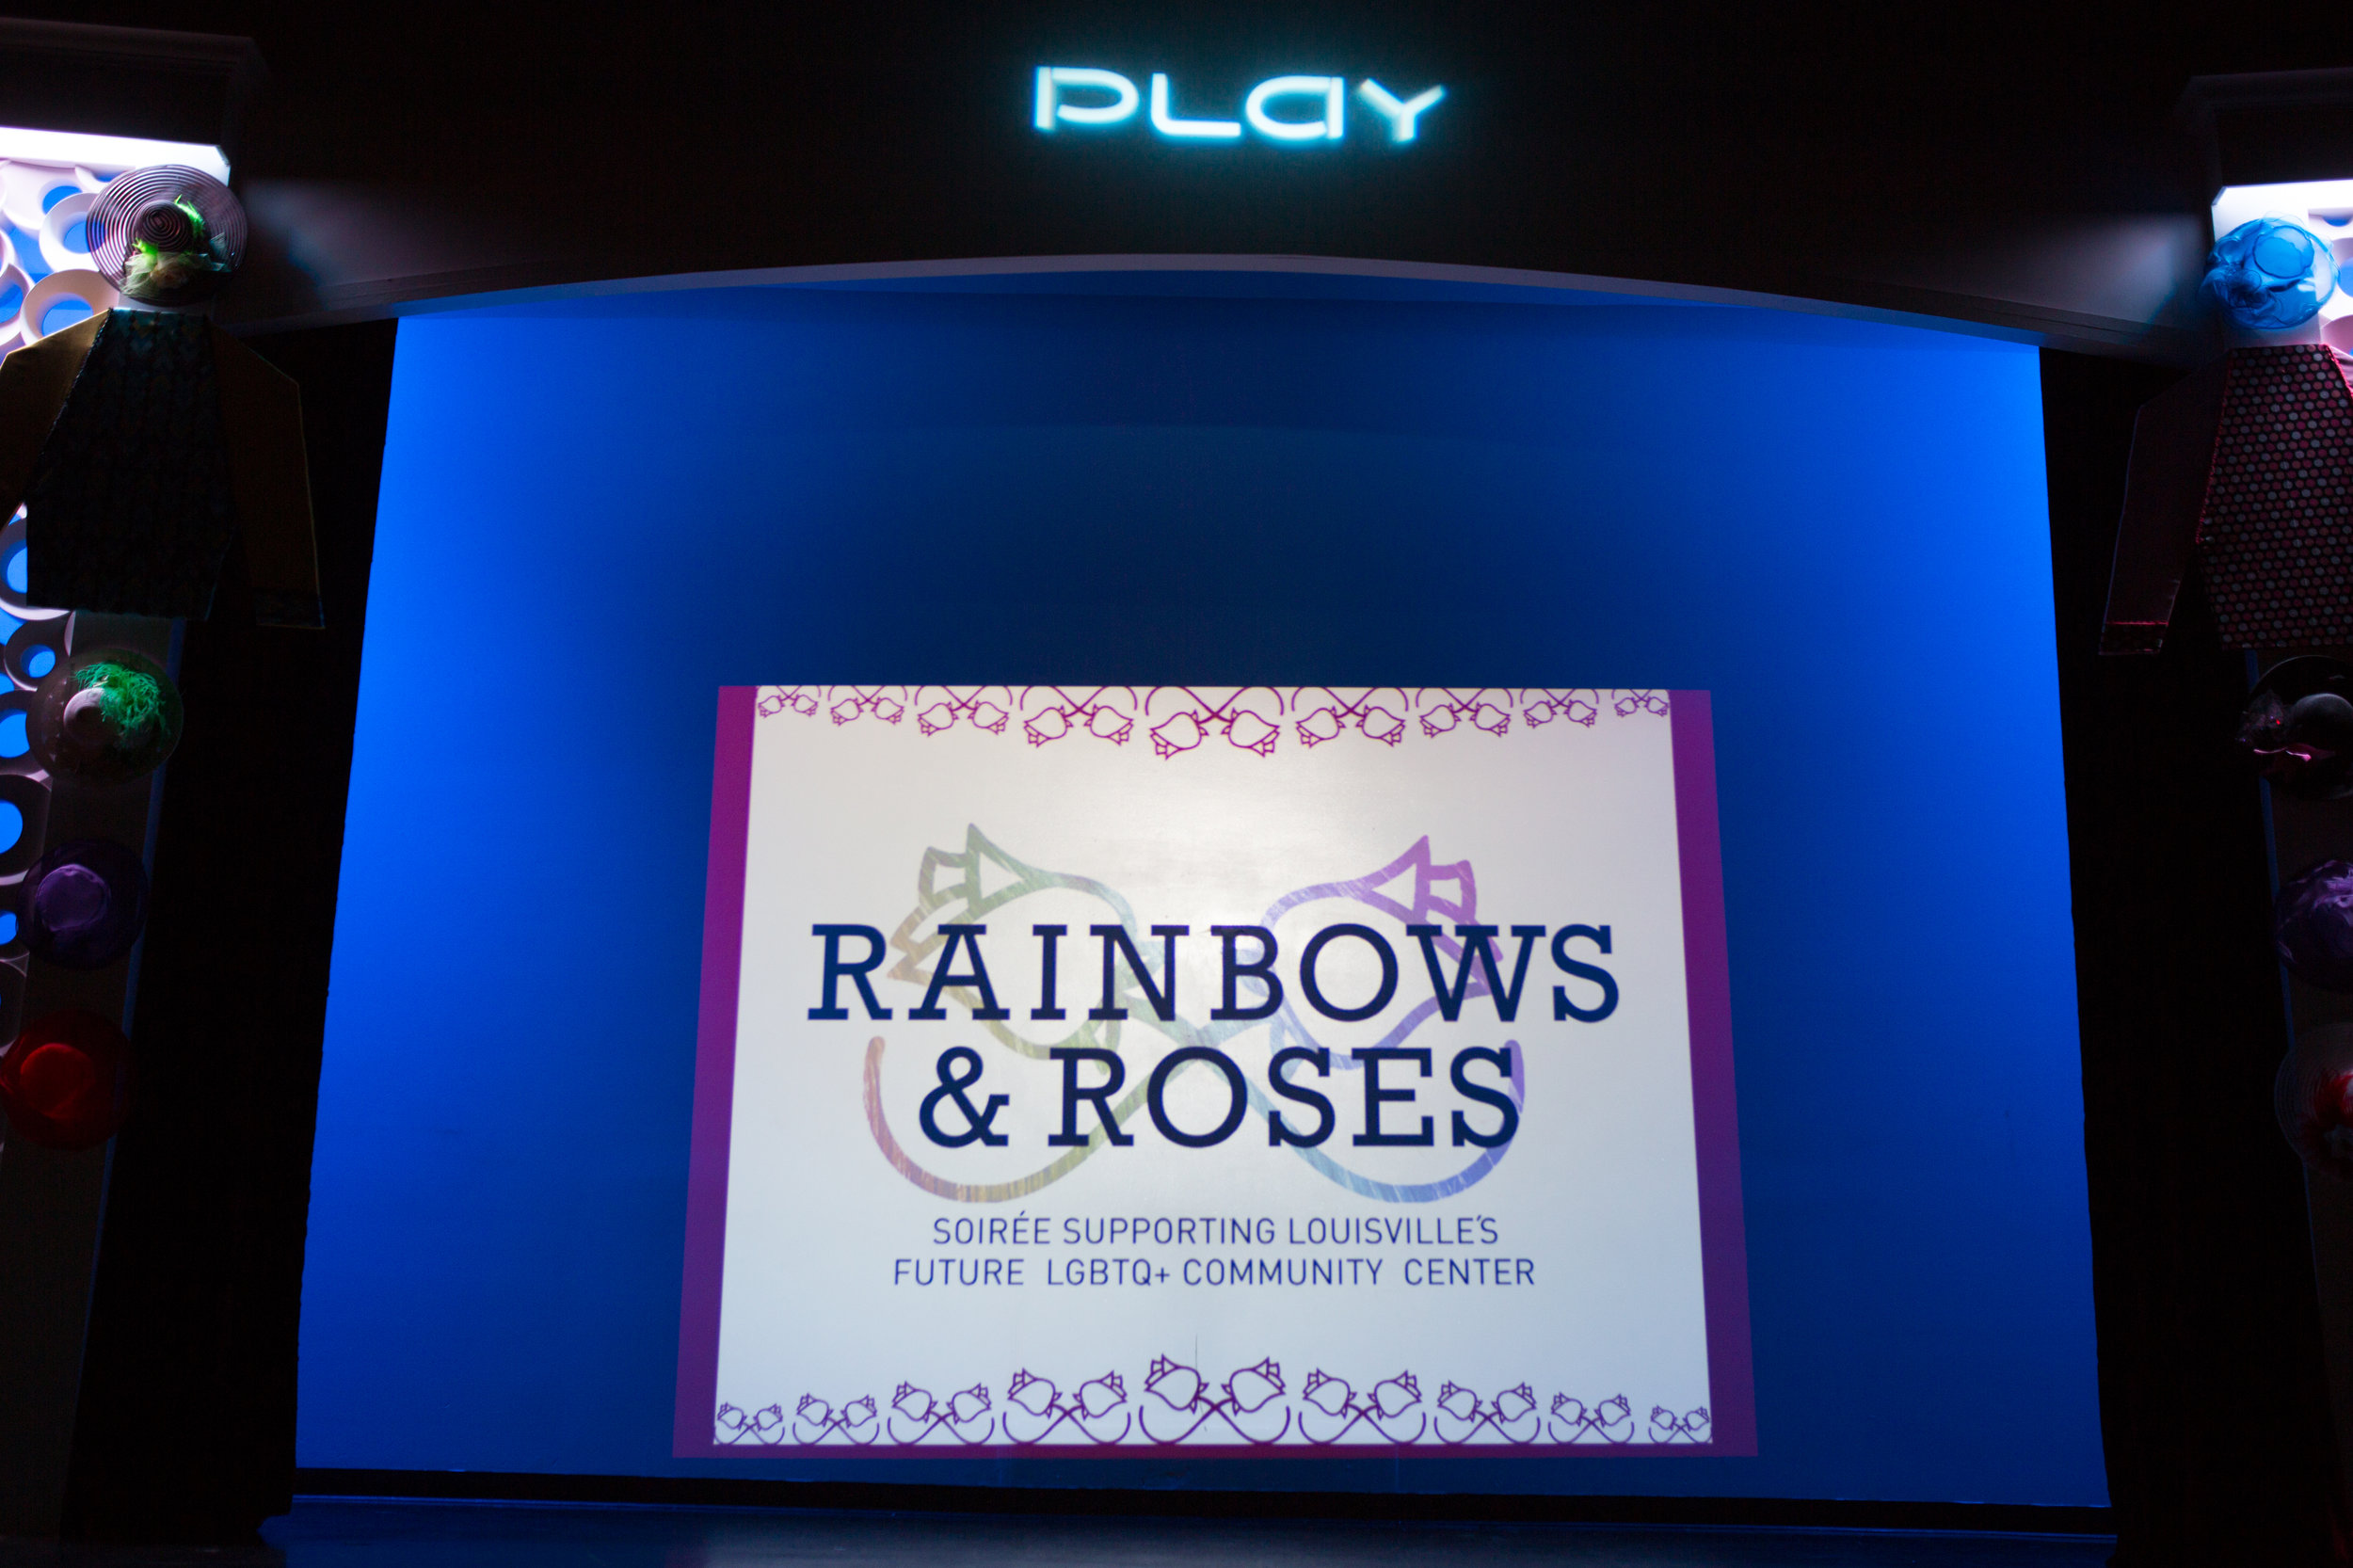 Rainbows & Roses Thurby 2017 WEBSITE FEVA PLAY Crystal Ludwick Photo 31.jpg